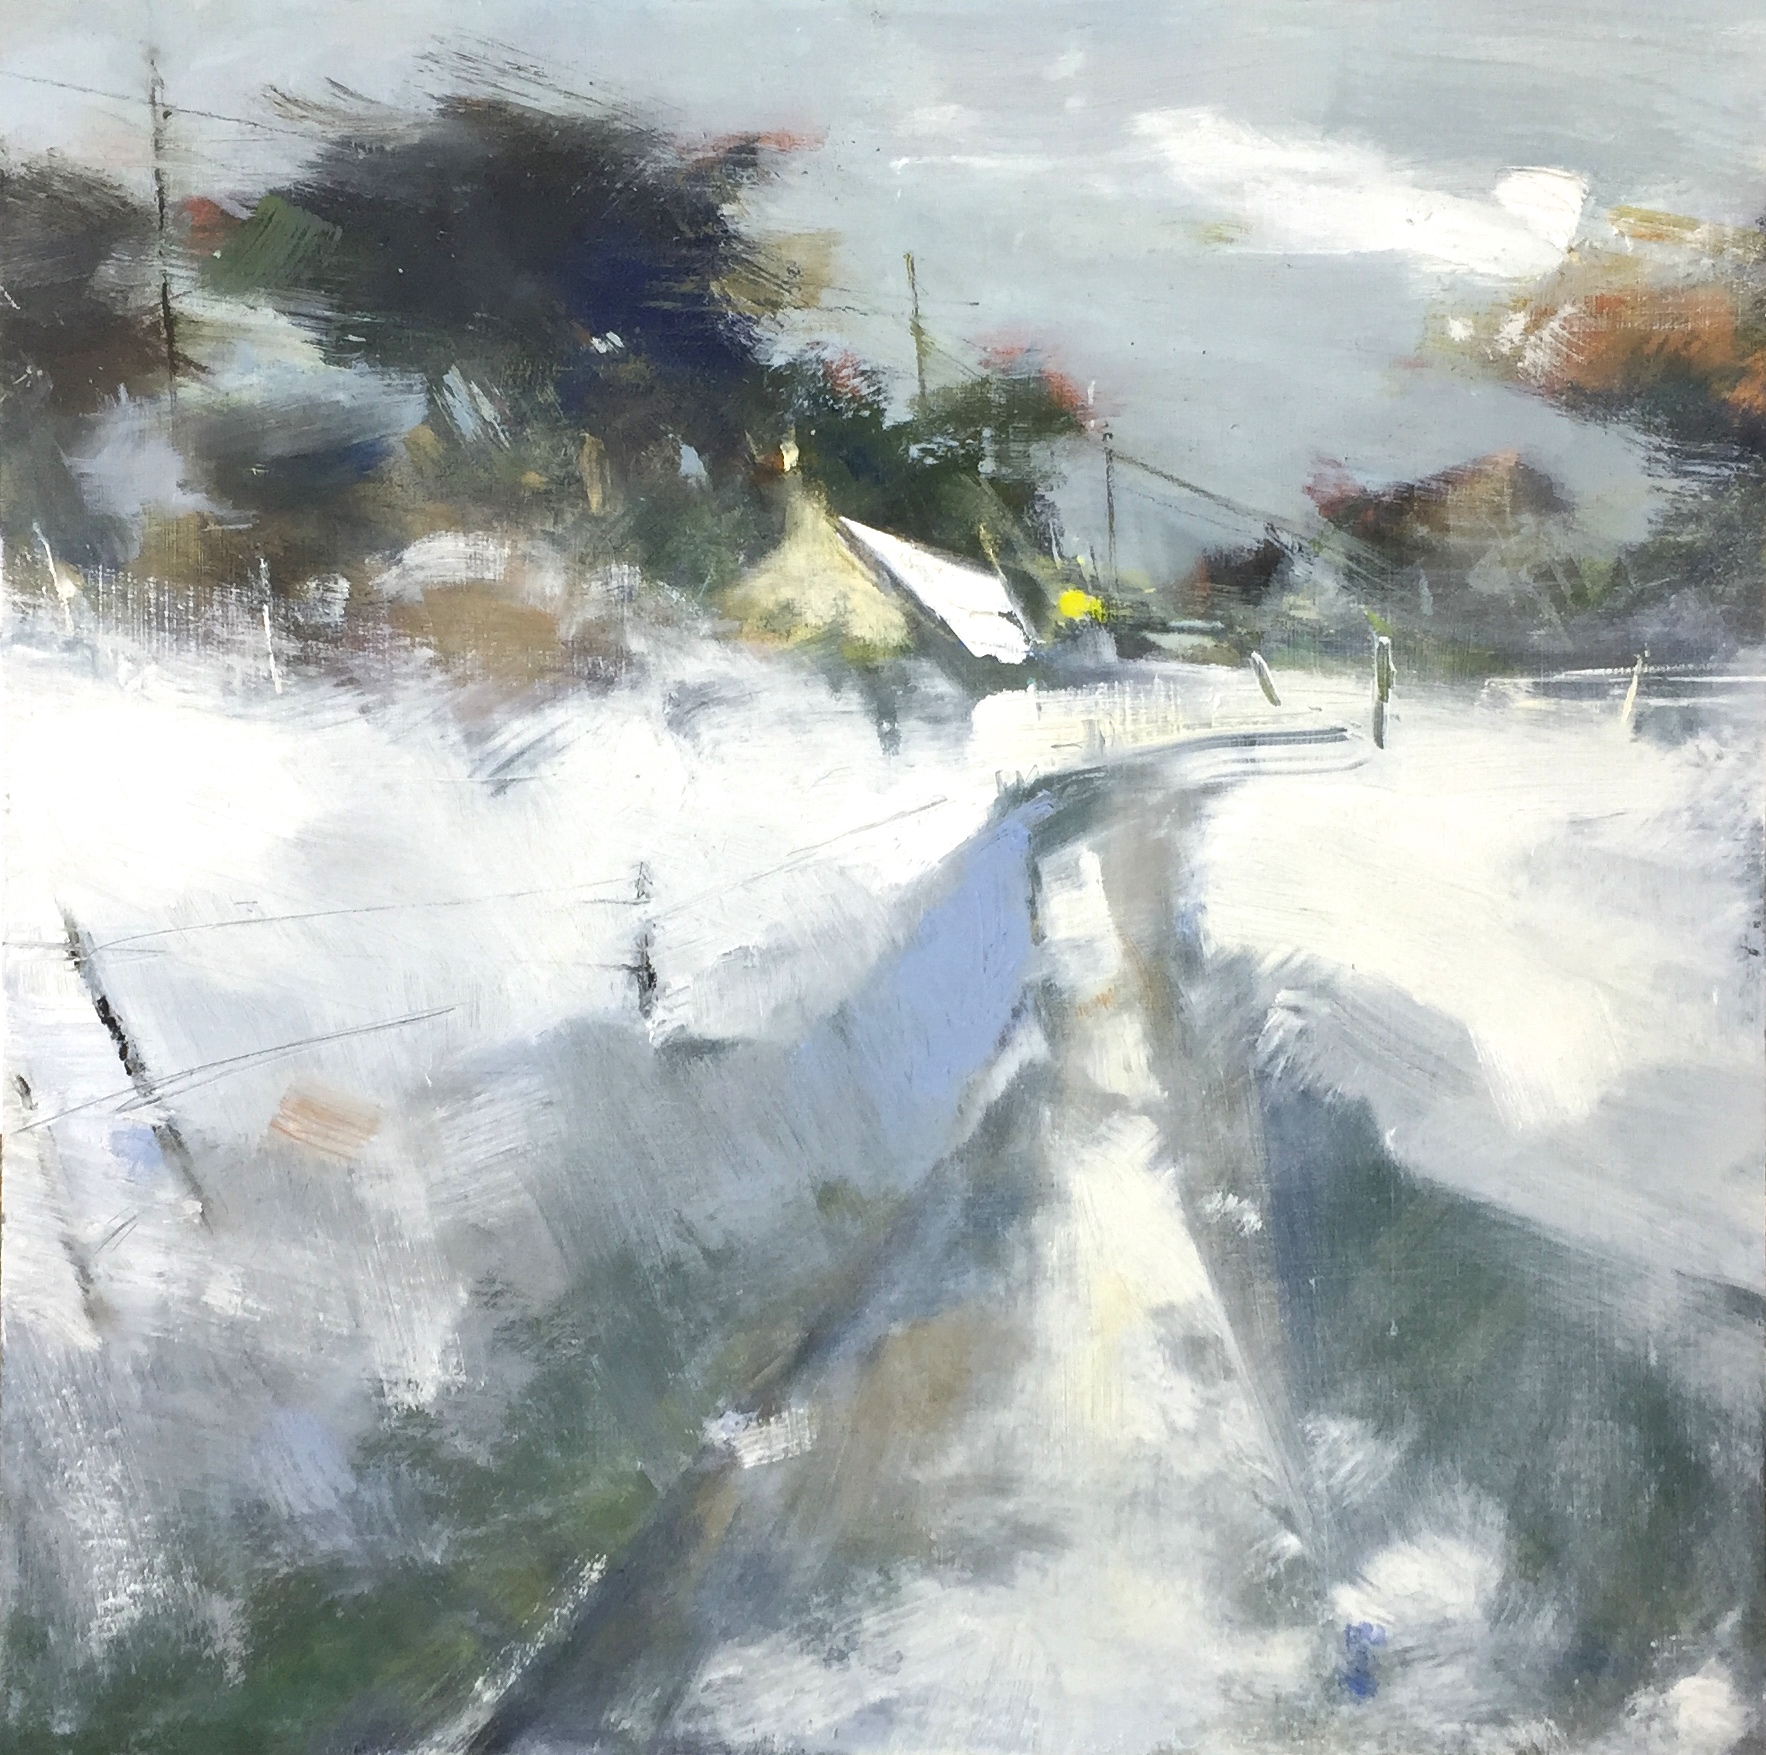 Snow Blanket, Cornish Village.  Oil on board. 44 x 44cm.  Sold